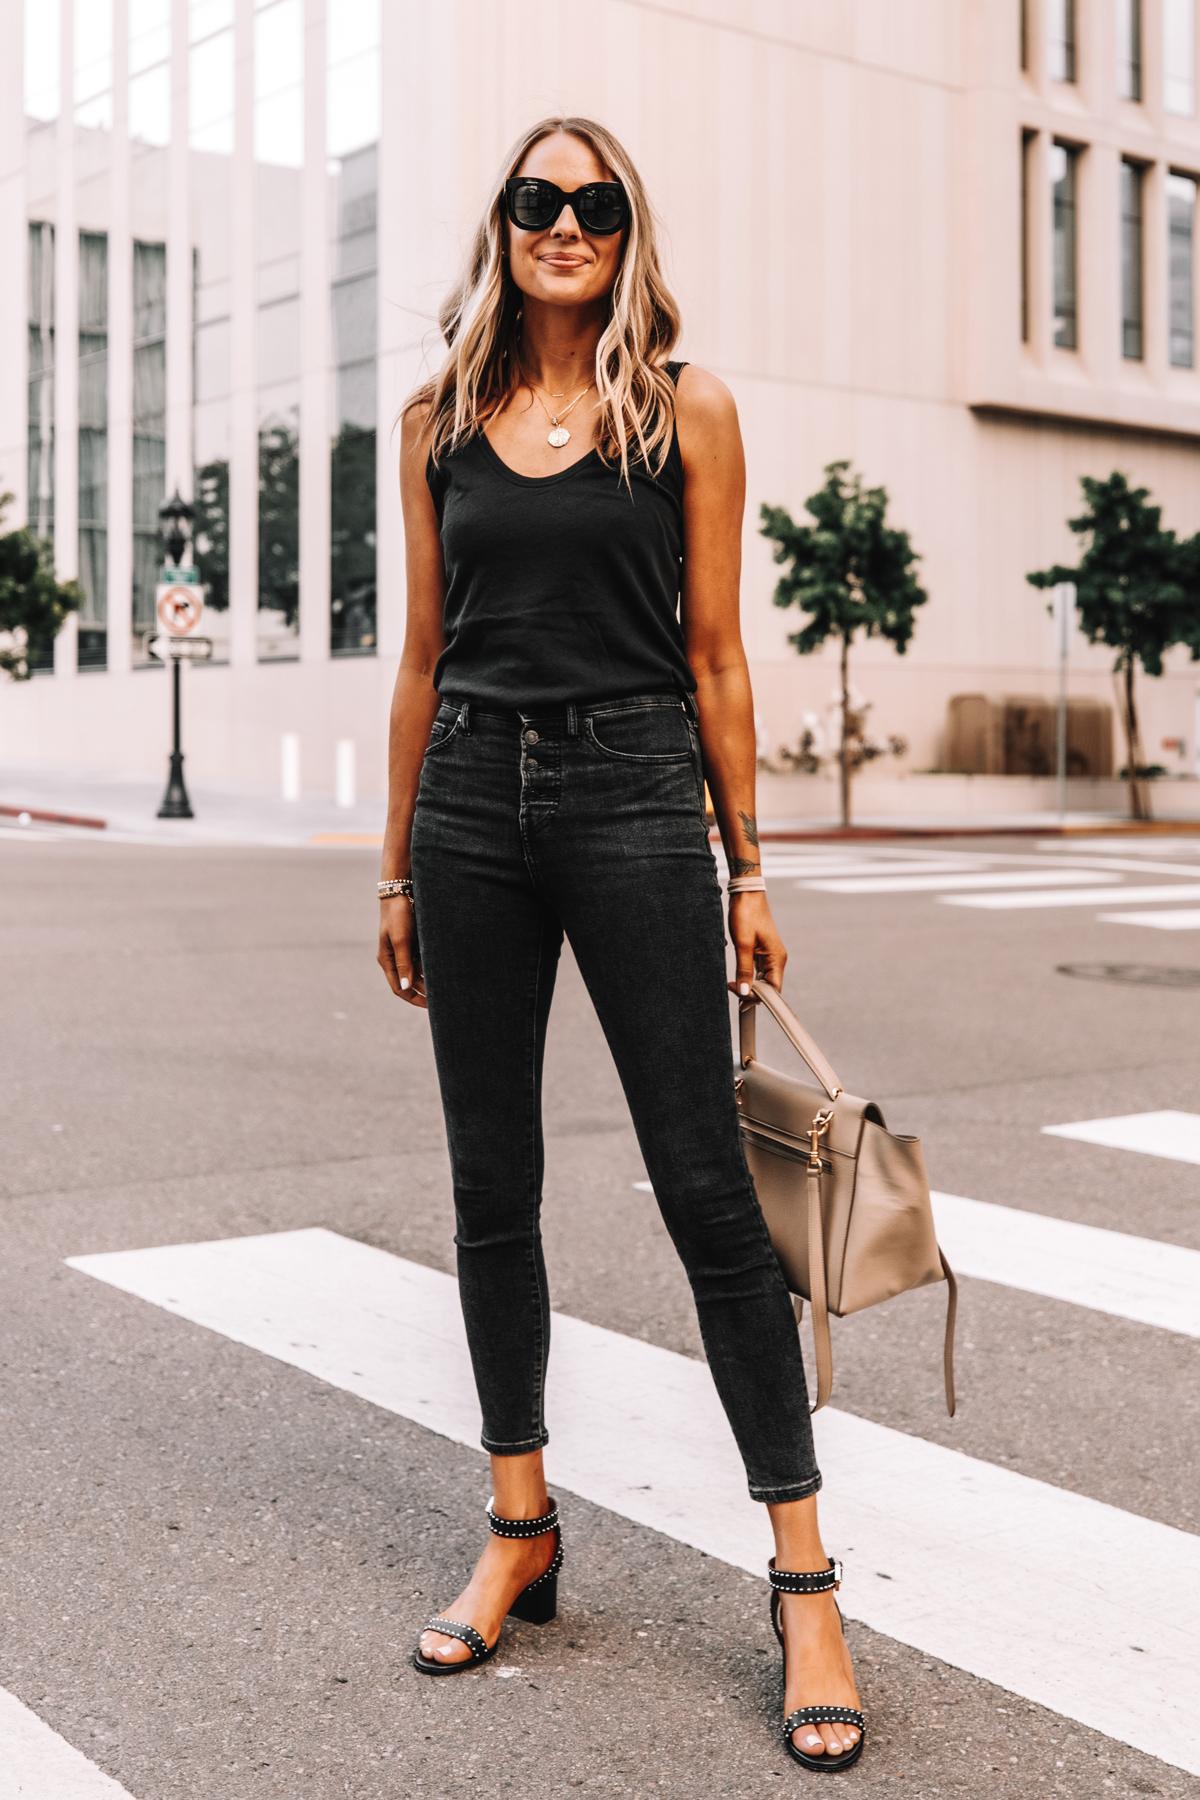 Fashion Jackson Wearing Everlane Black The Air Cami Everlane Black Skinny Jeans Givenchy Black Elegant 60 studded leather sandals 1